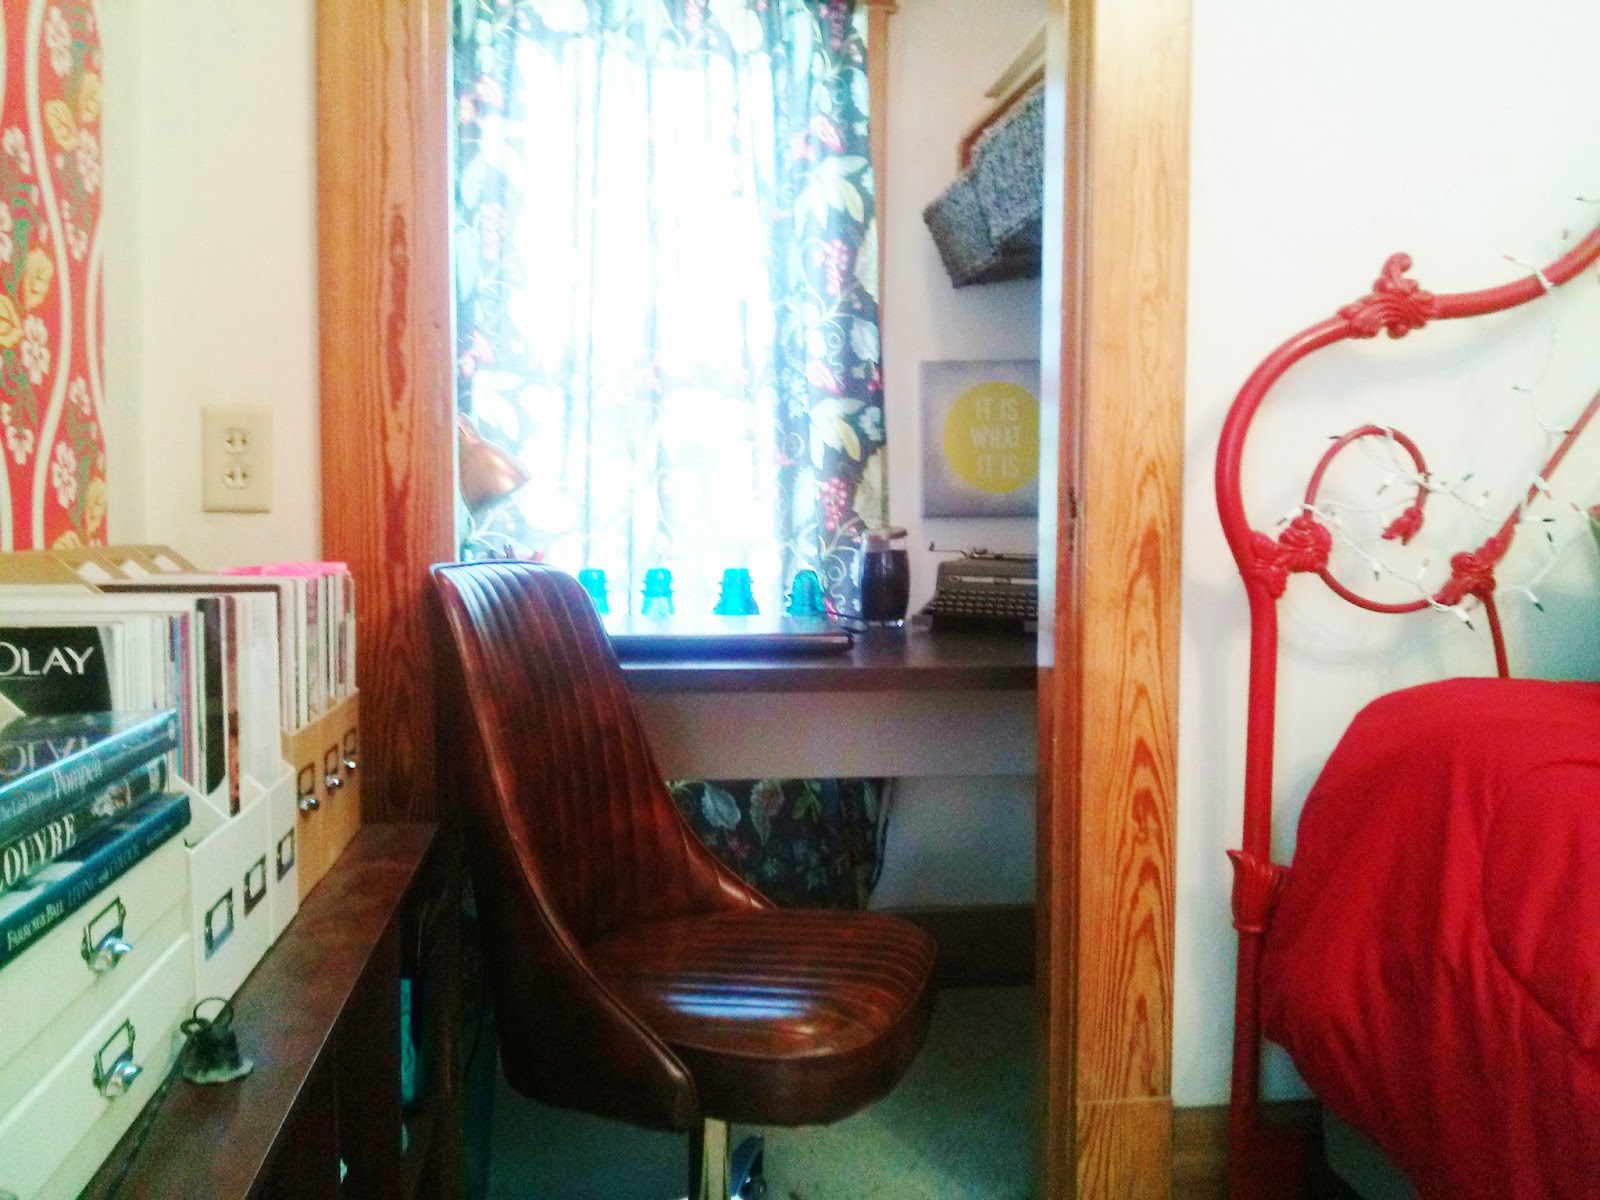 Craigslist Apartments For Rent Baltimore